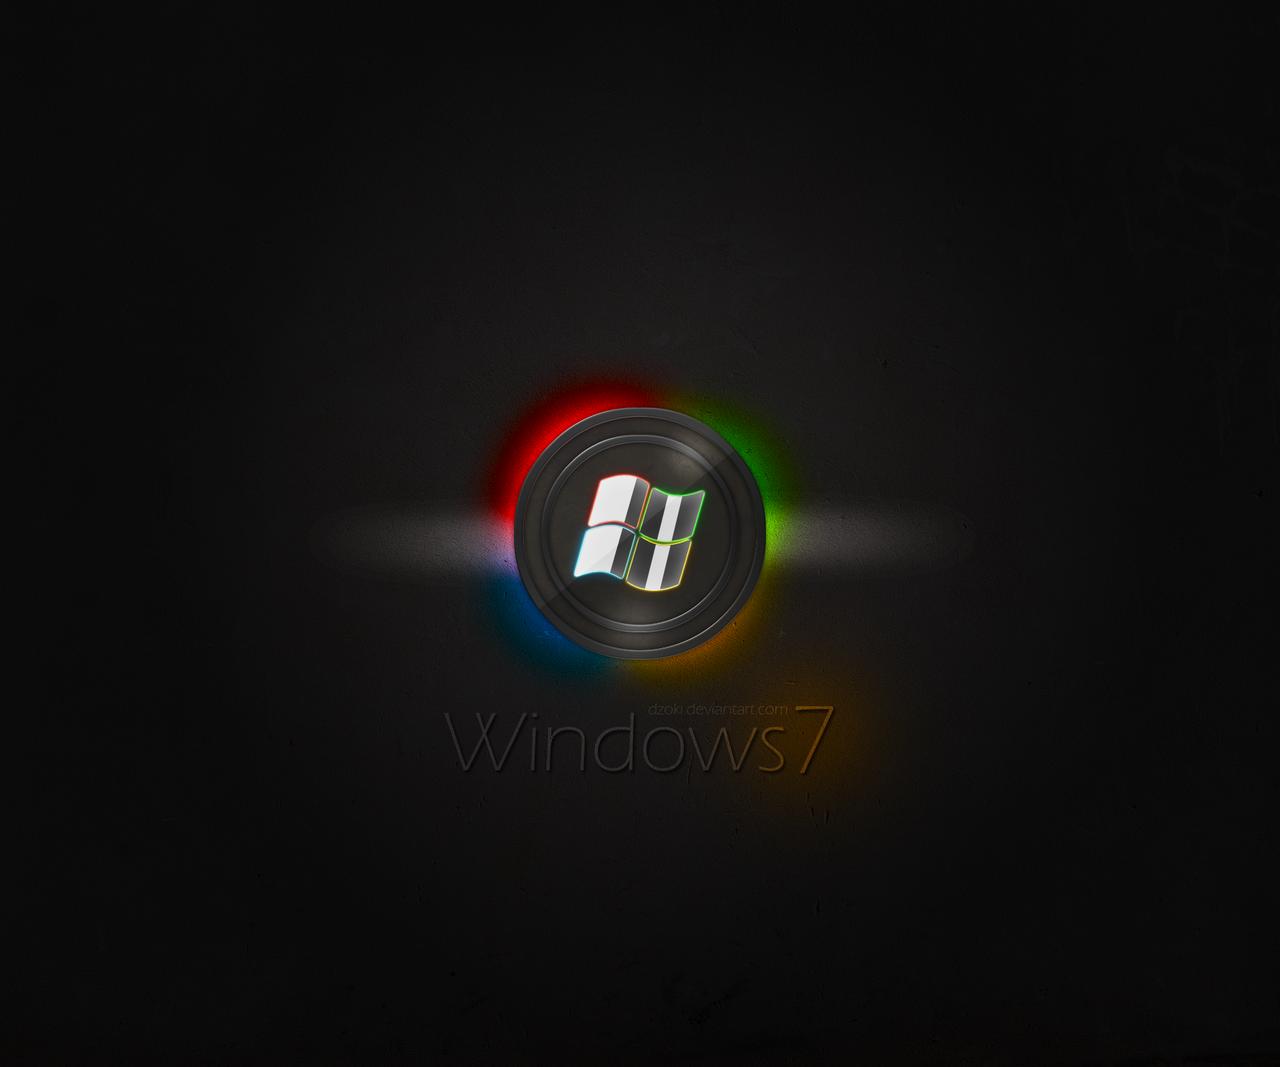 Windows 10 Wallpaper 1920X1200